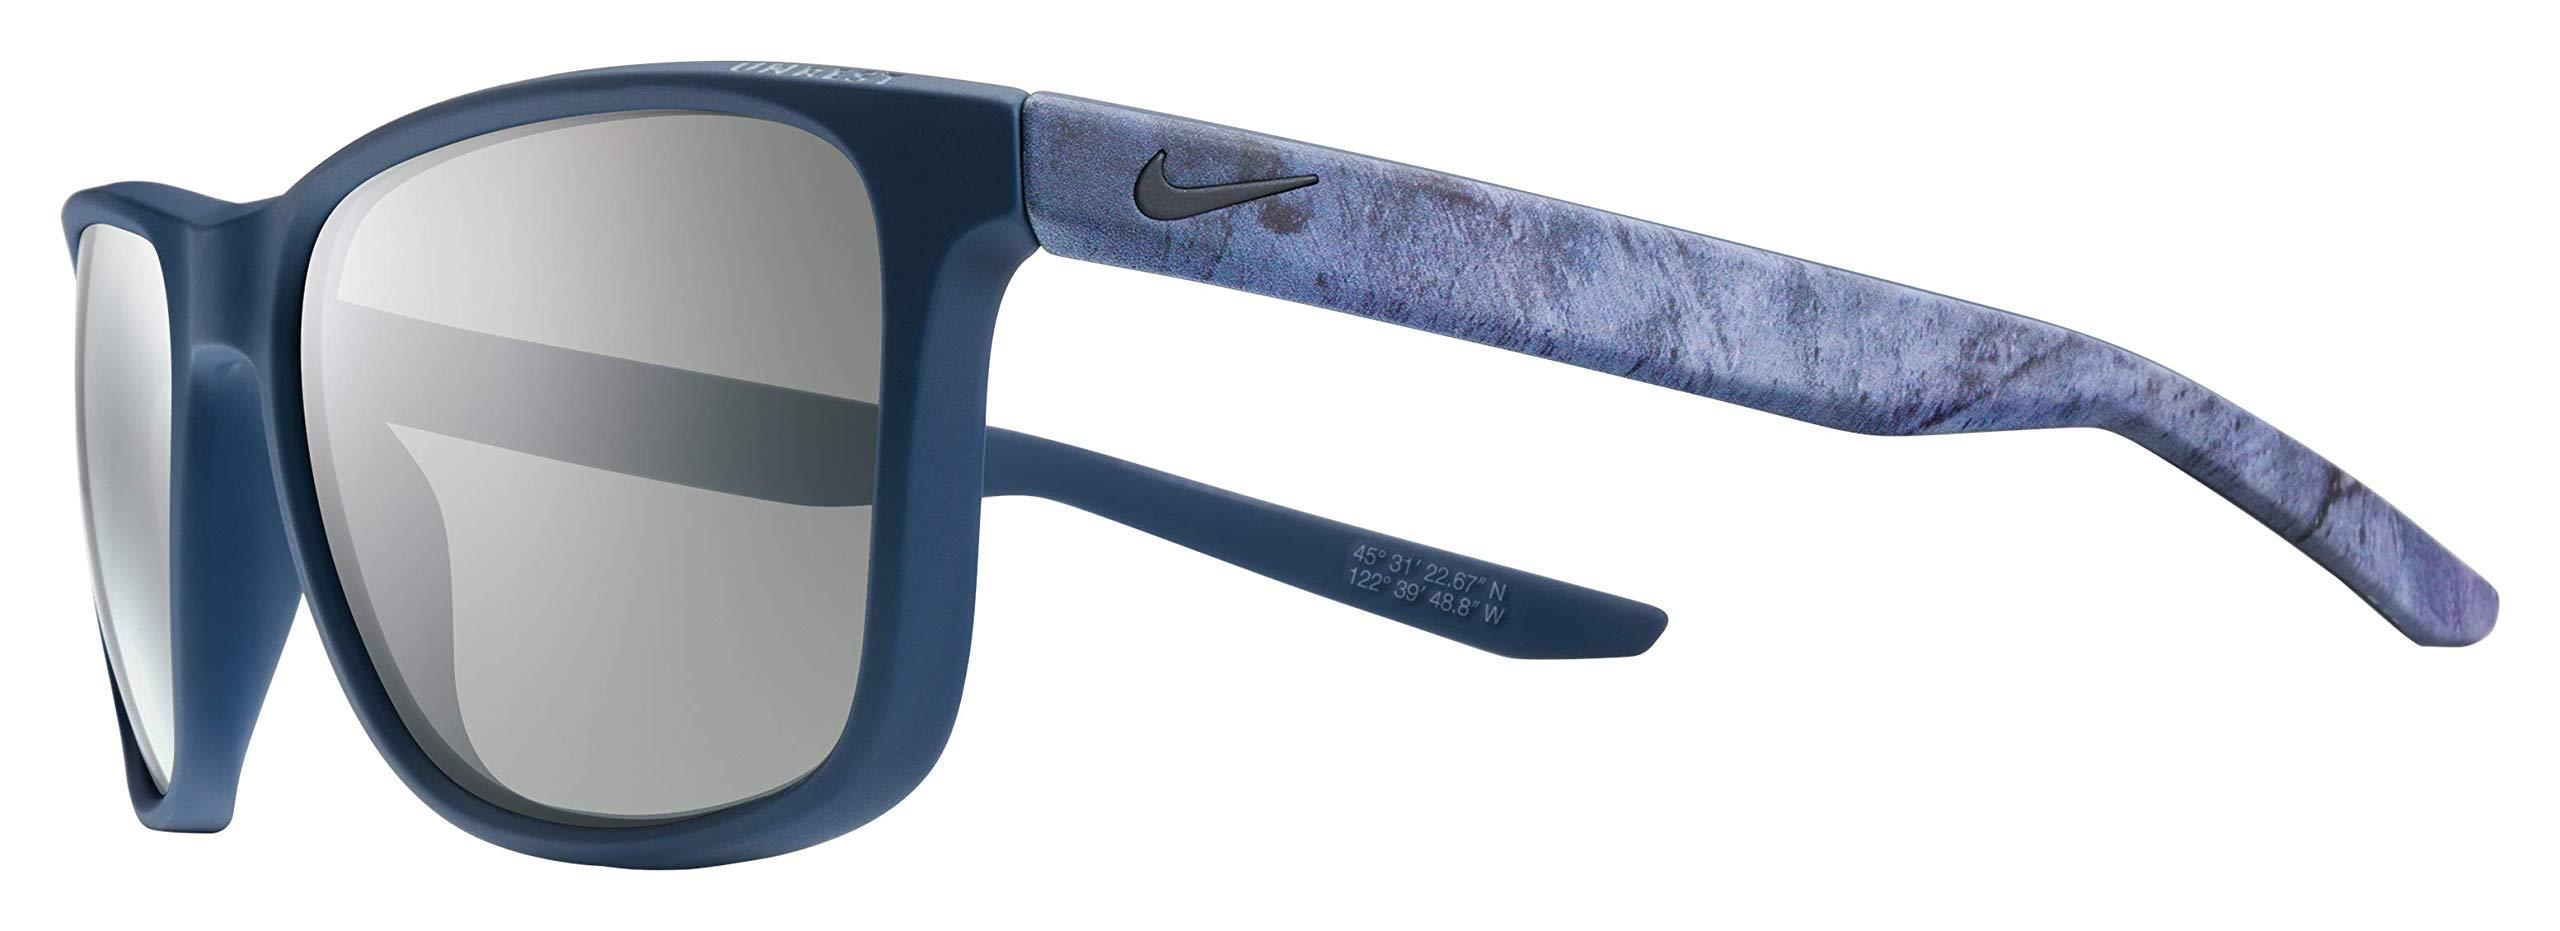 Nike Golf Men's Unrest Se Rectangular Sunglasses, Matte Squadron Blue/Deep Pewter Frame, 57 mm